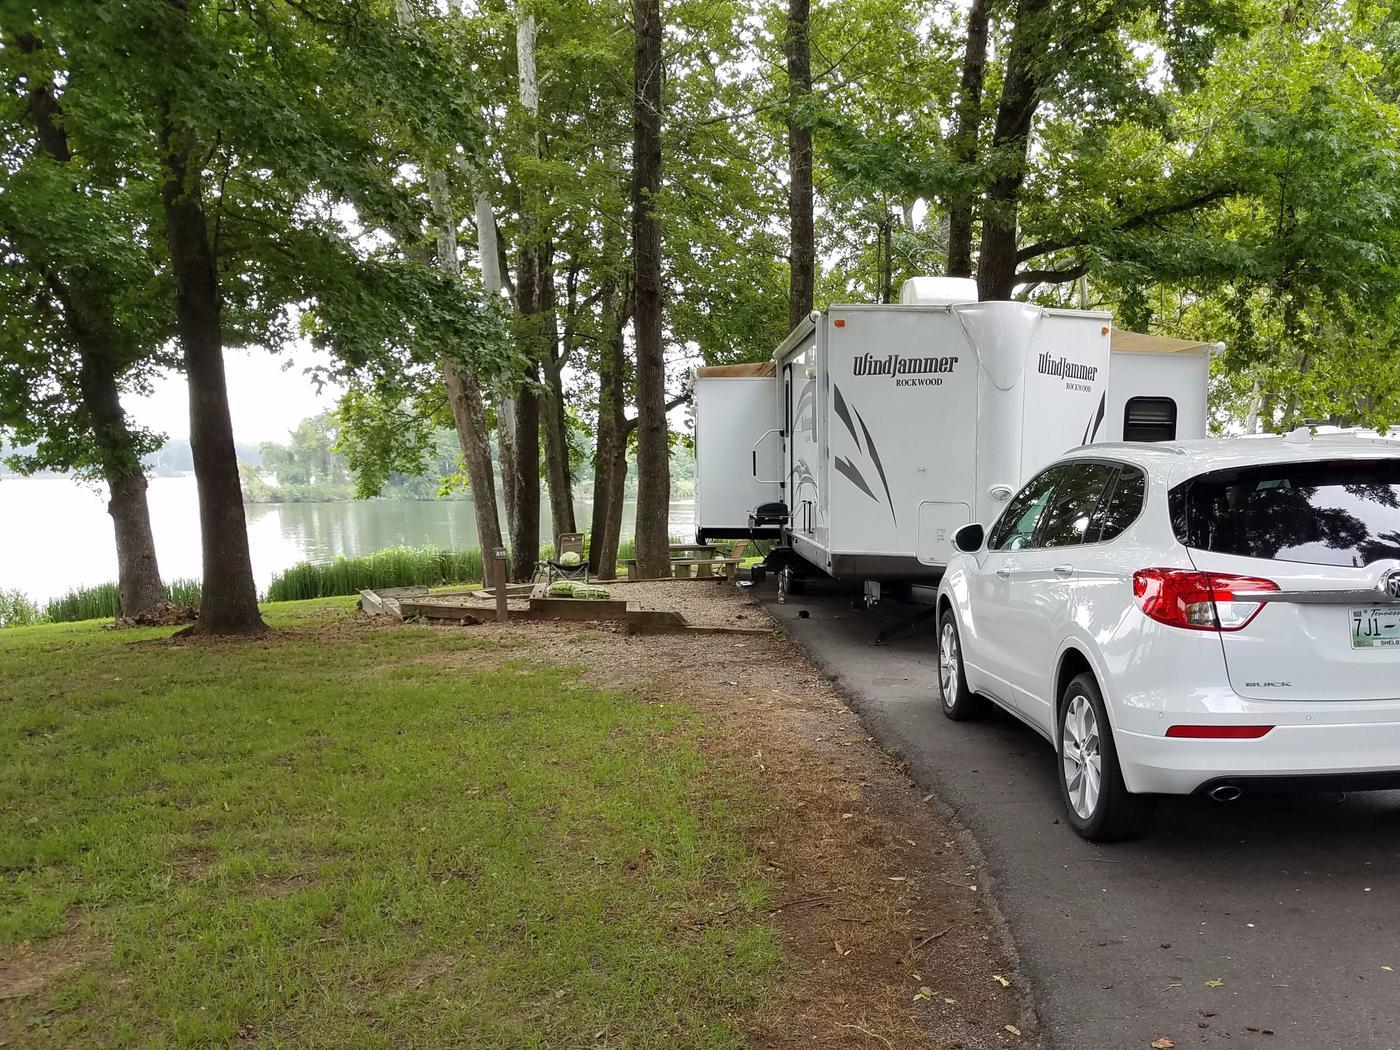 Campsite A15